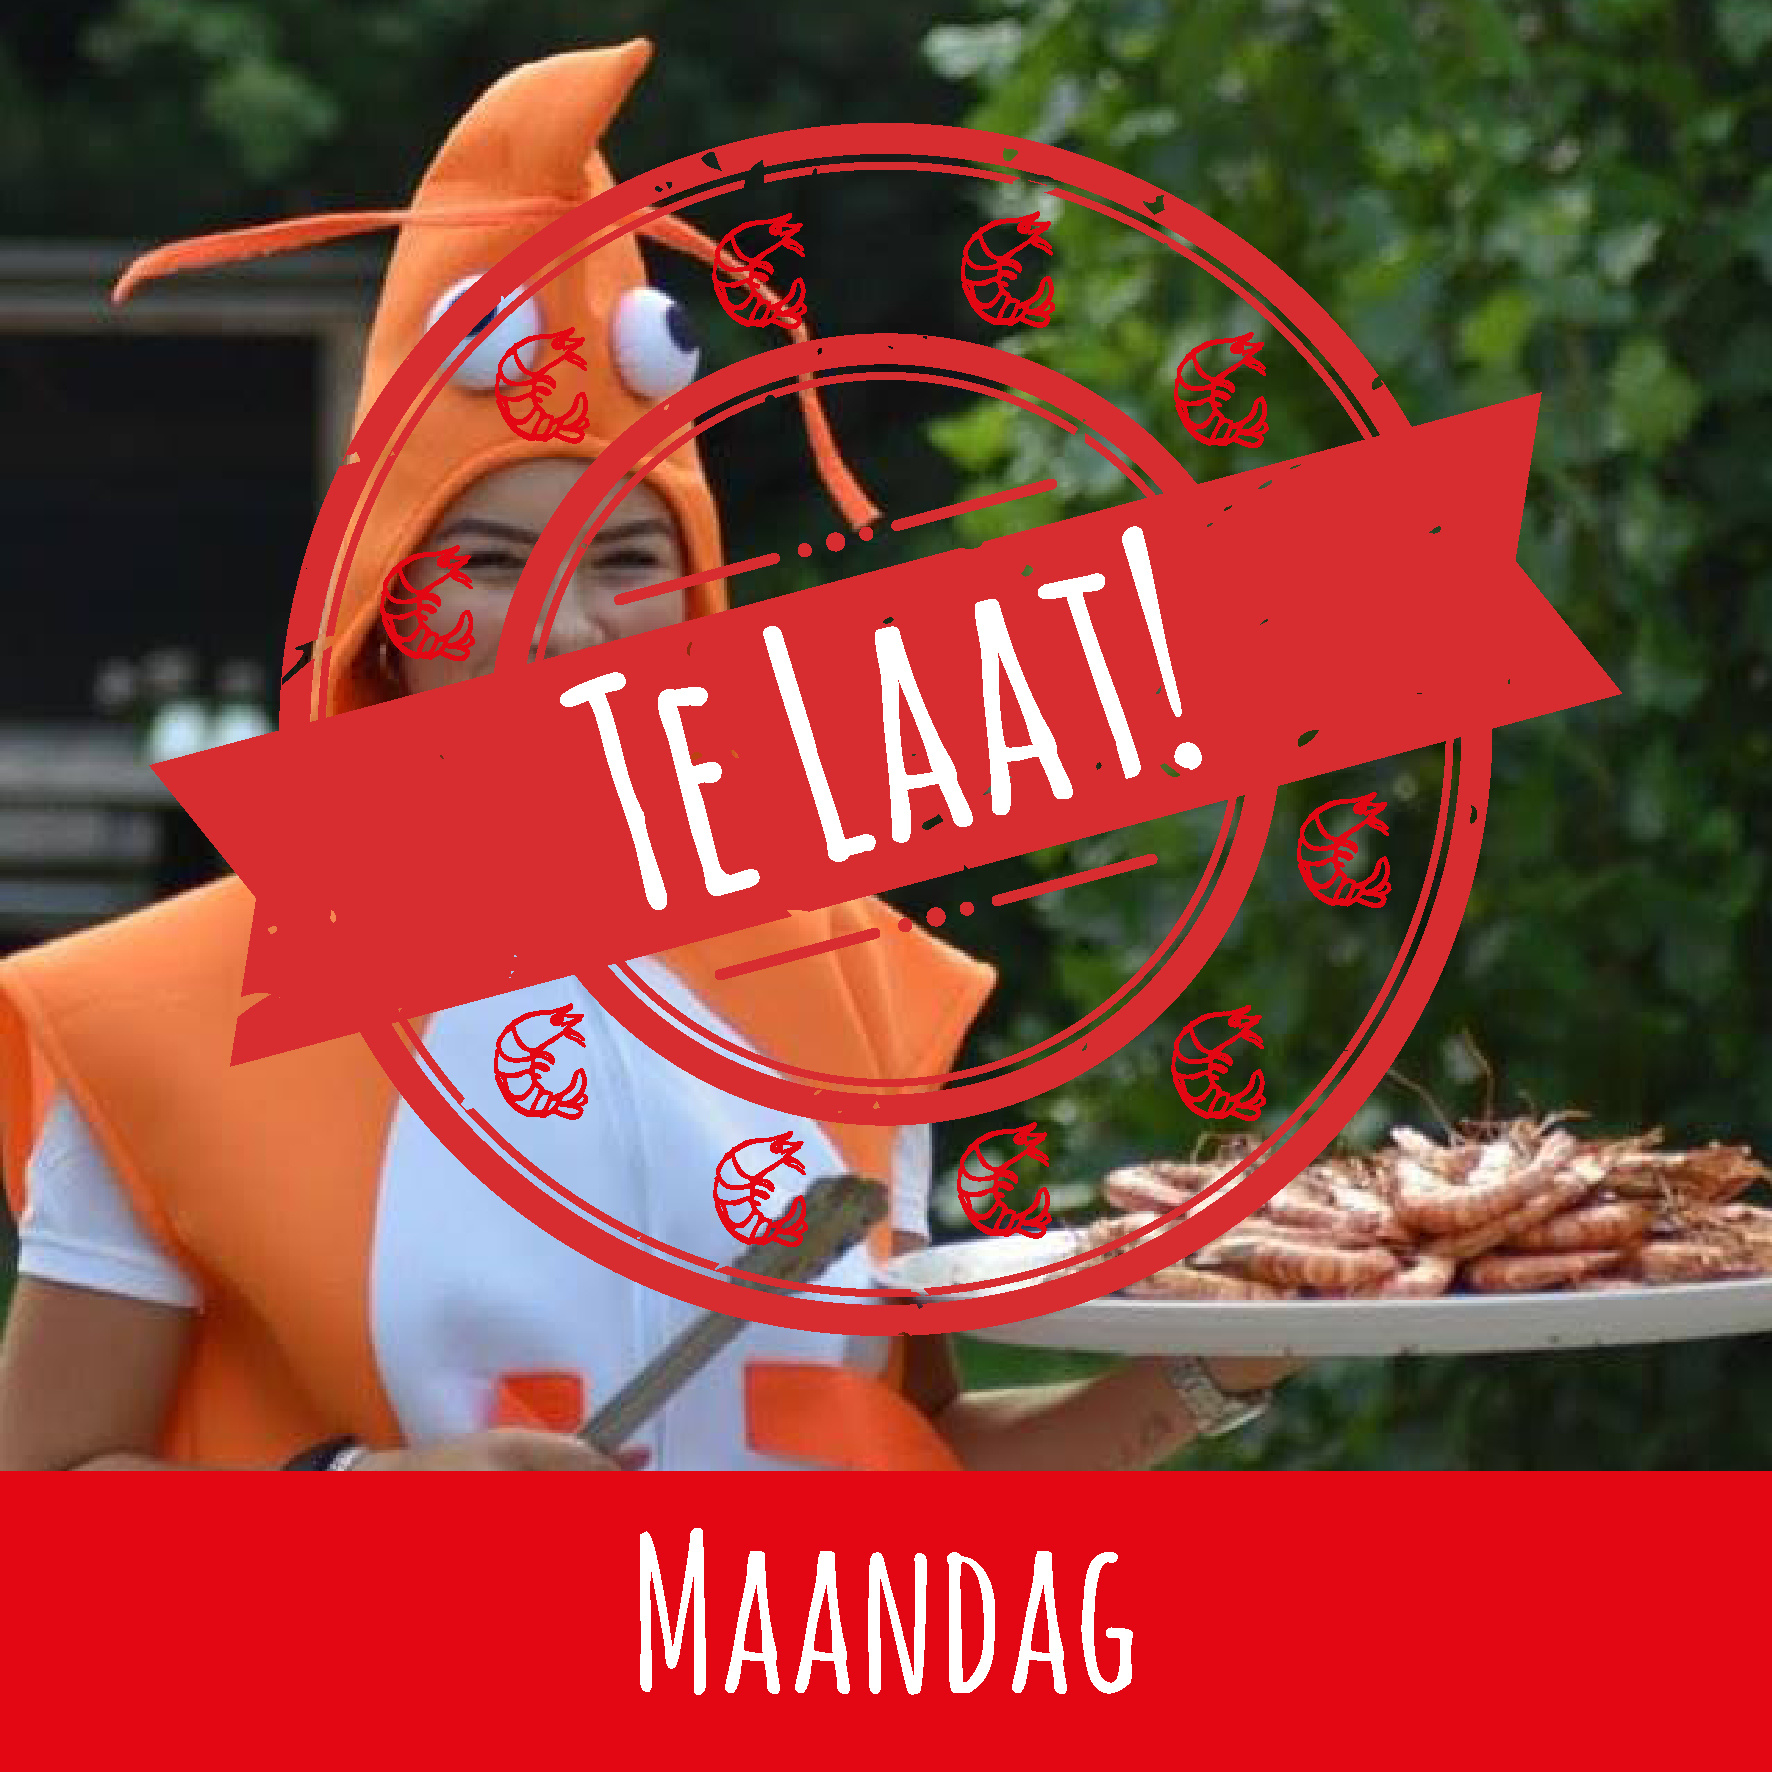 GigaGamba Zomer Festijn Maandag